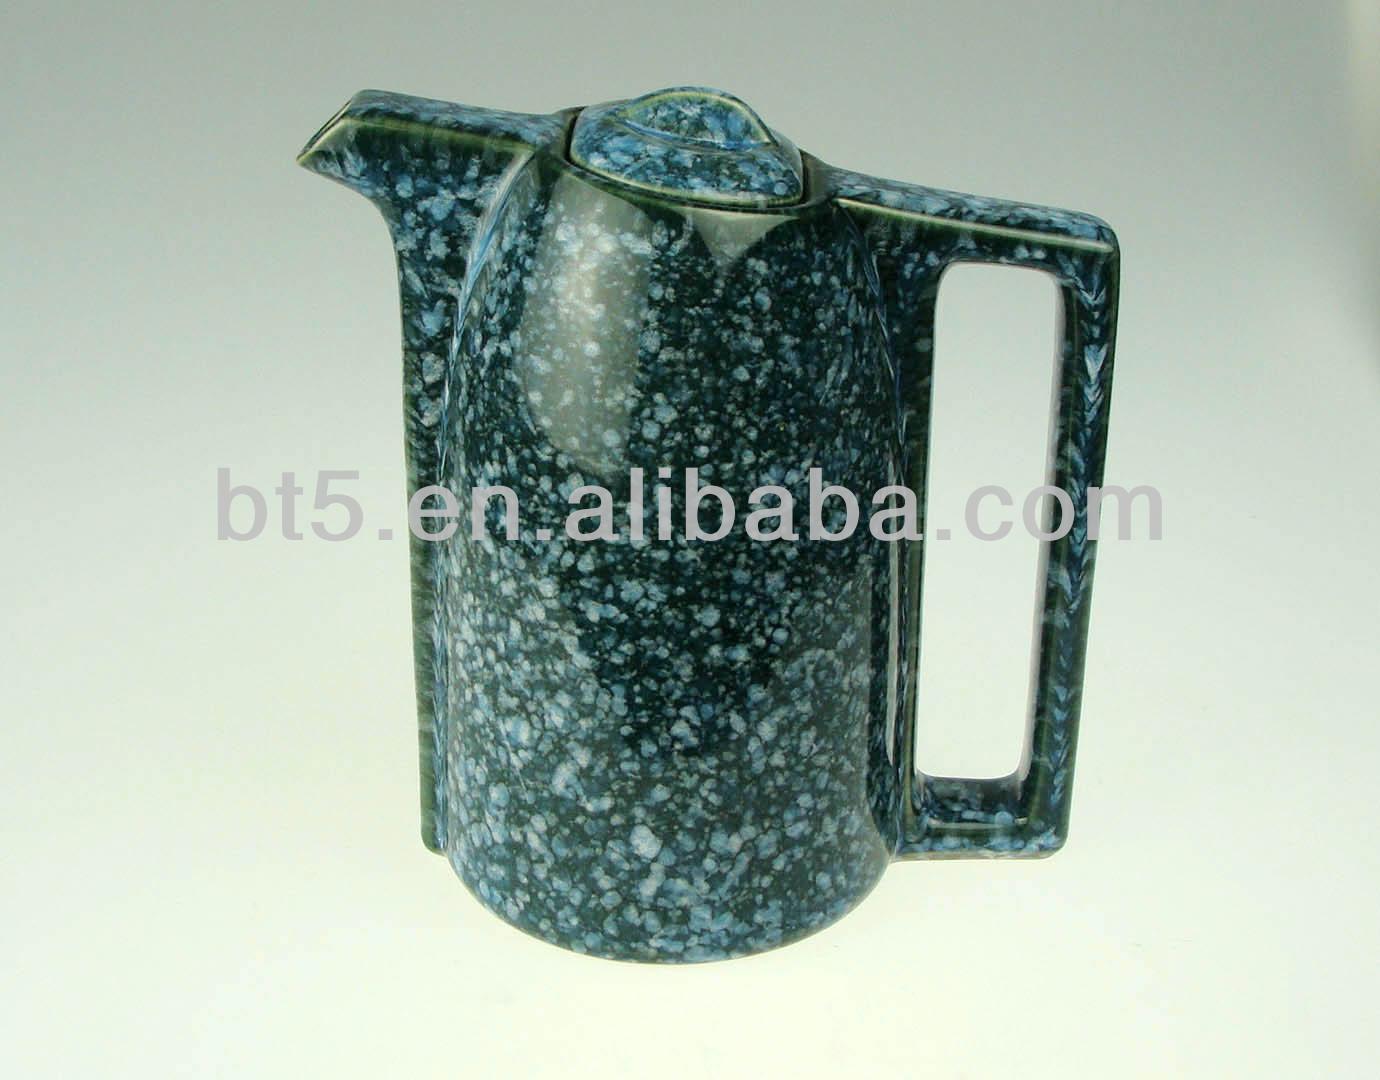 New Design Modern Unique Ceramic Teapots For Sale View